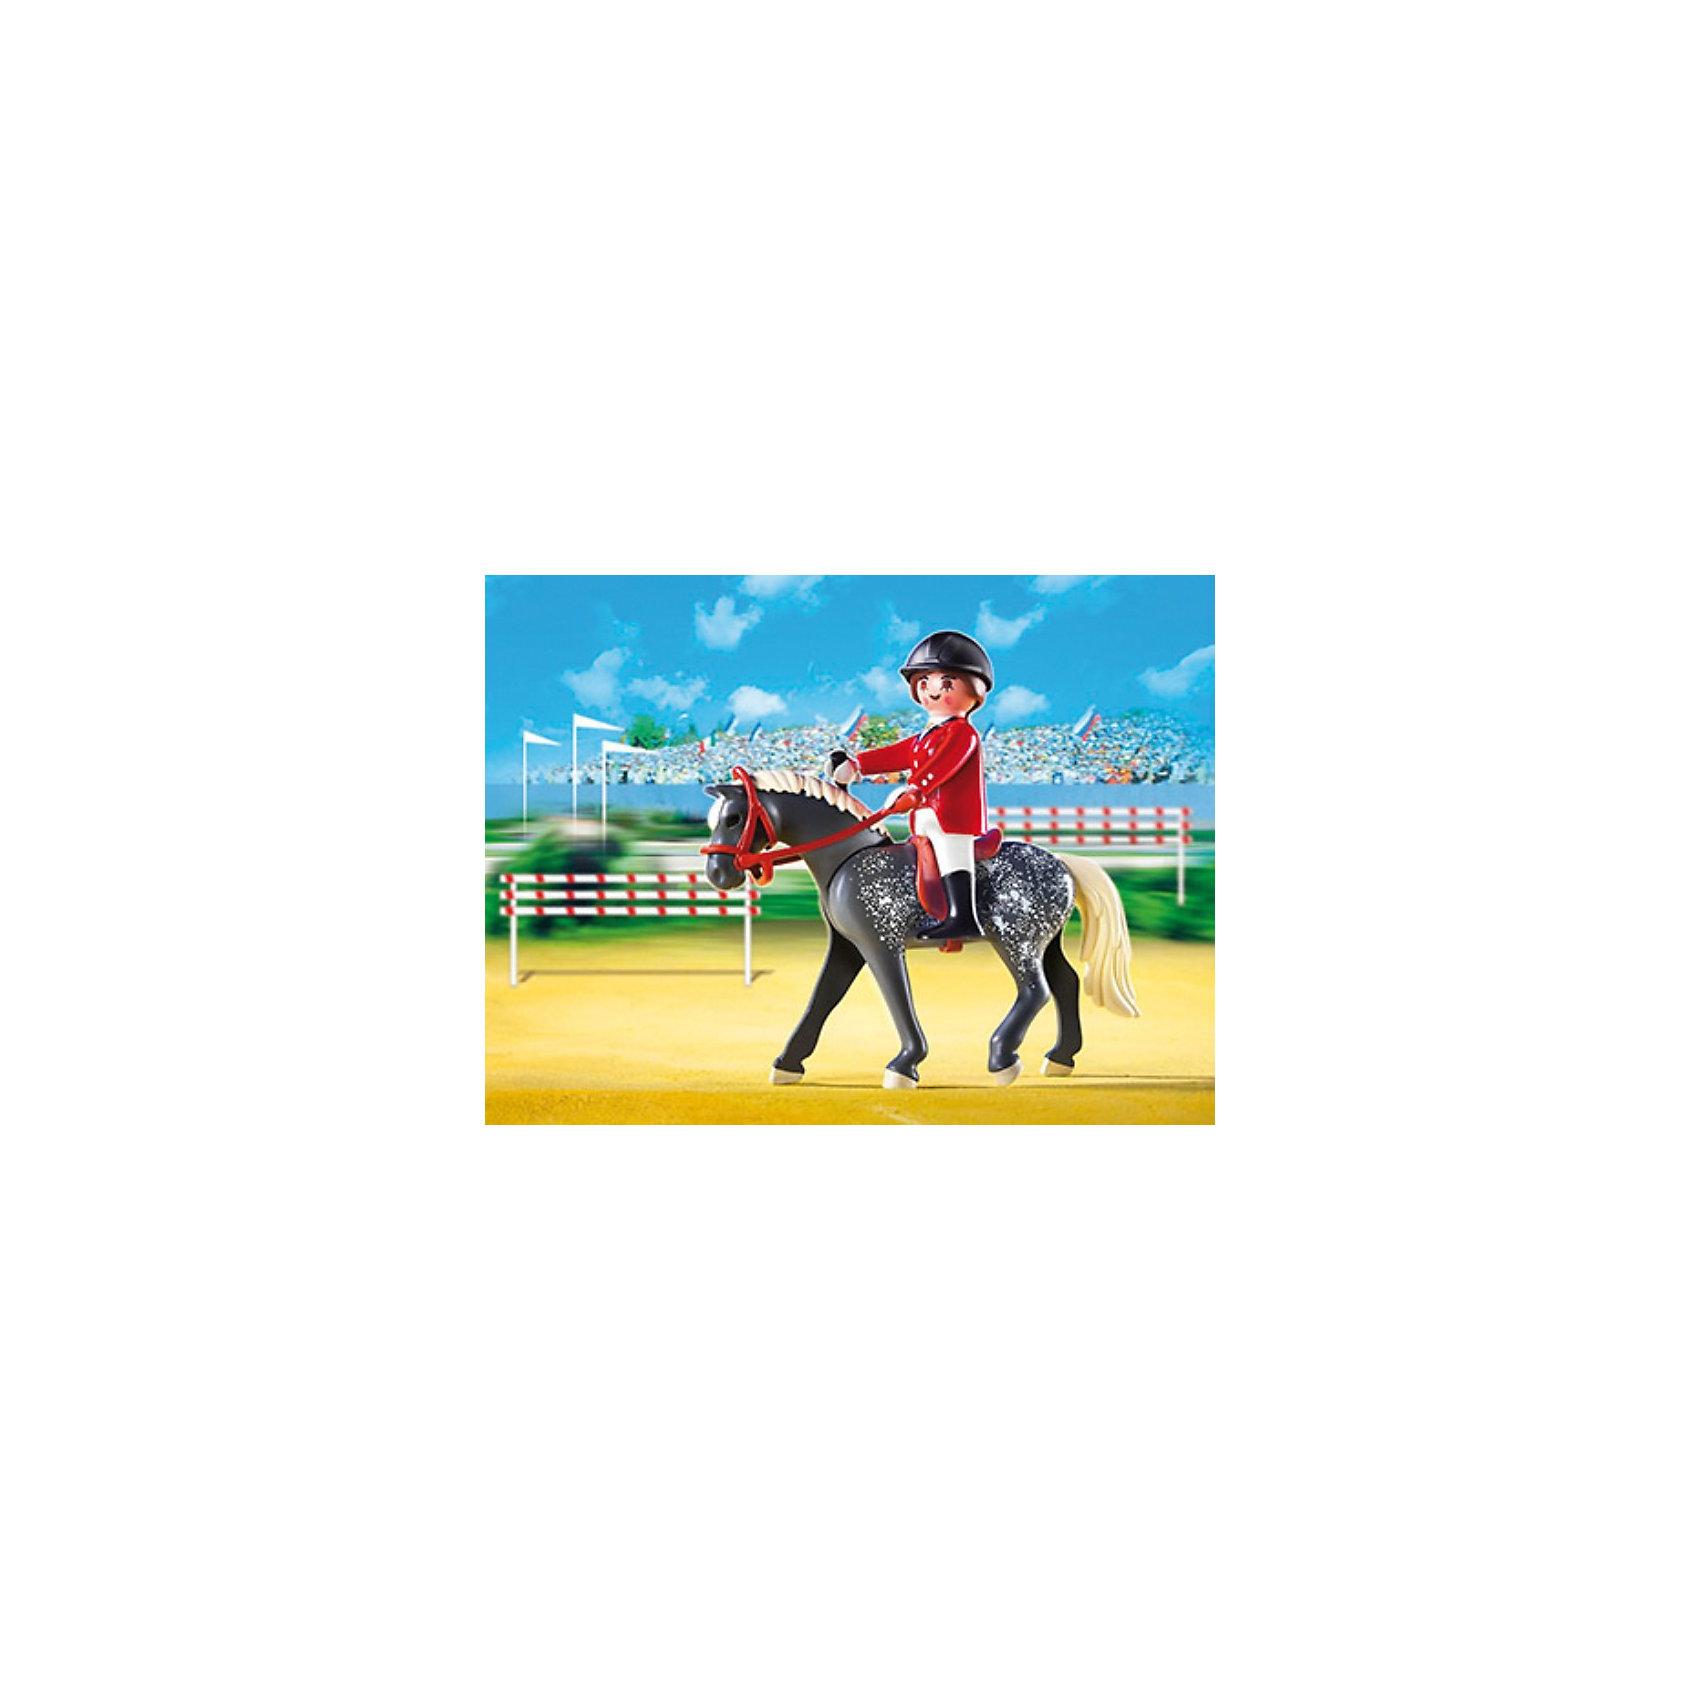 PLAYMOBIL® PLAYMOBIL 5110 Конный клуб: Трекерная лошадь со стойлом playmobil® playmobil 5546 парк развлечений продавец шаров smileyworld